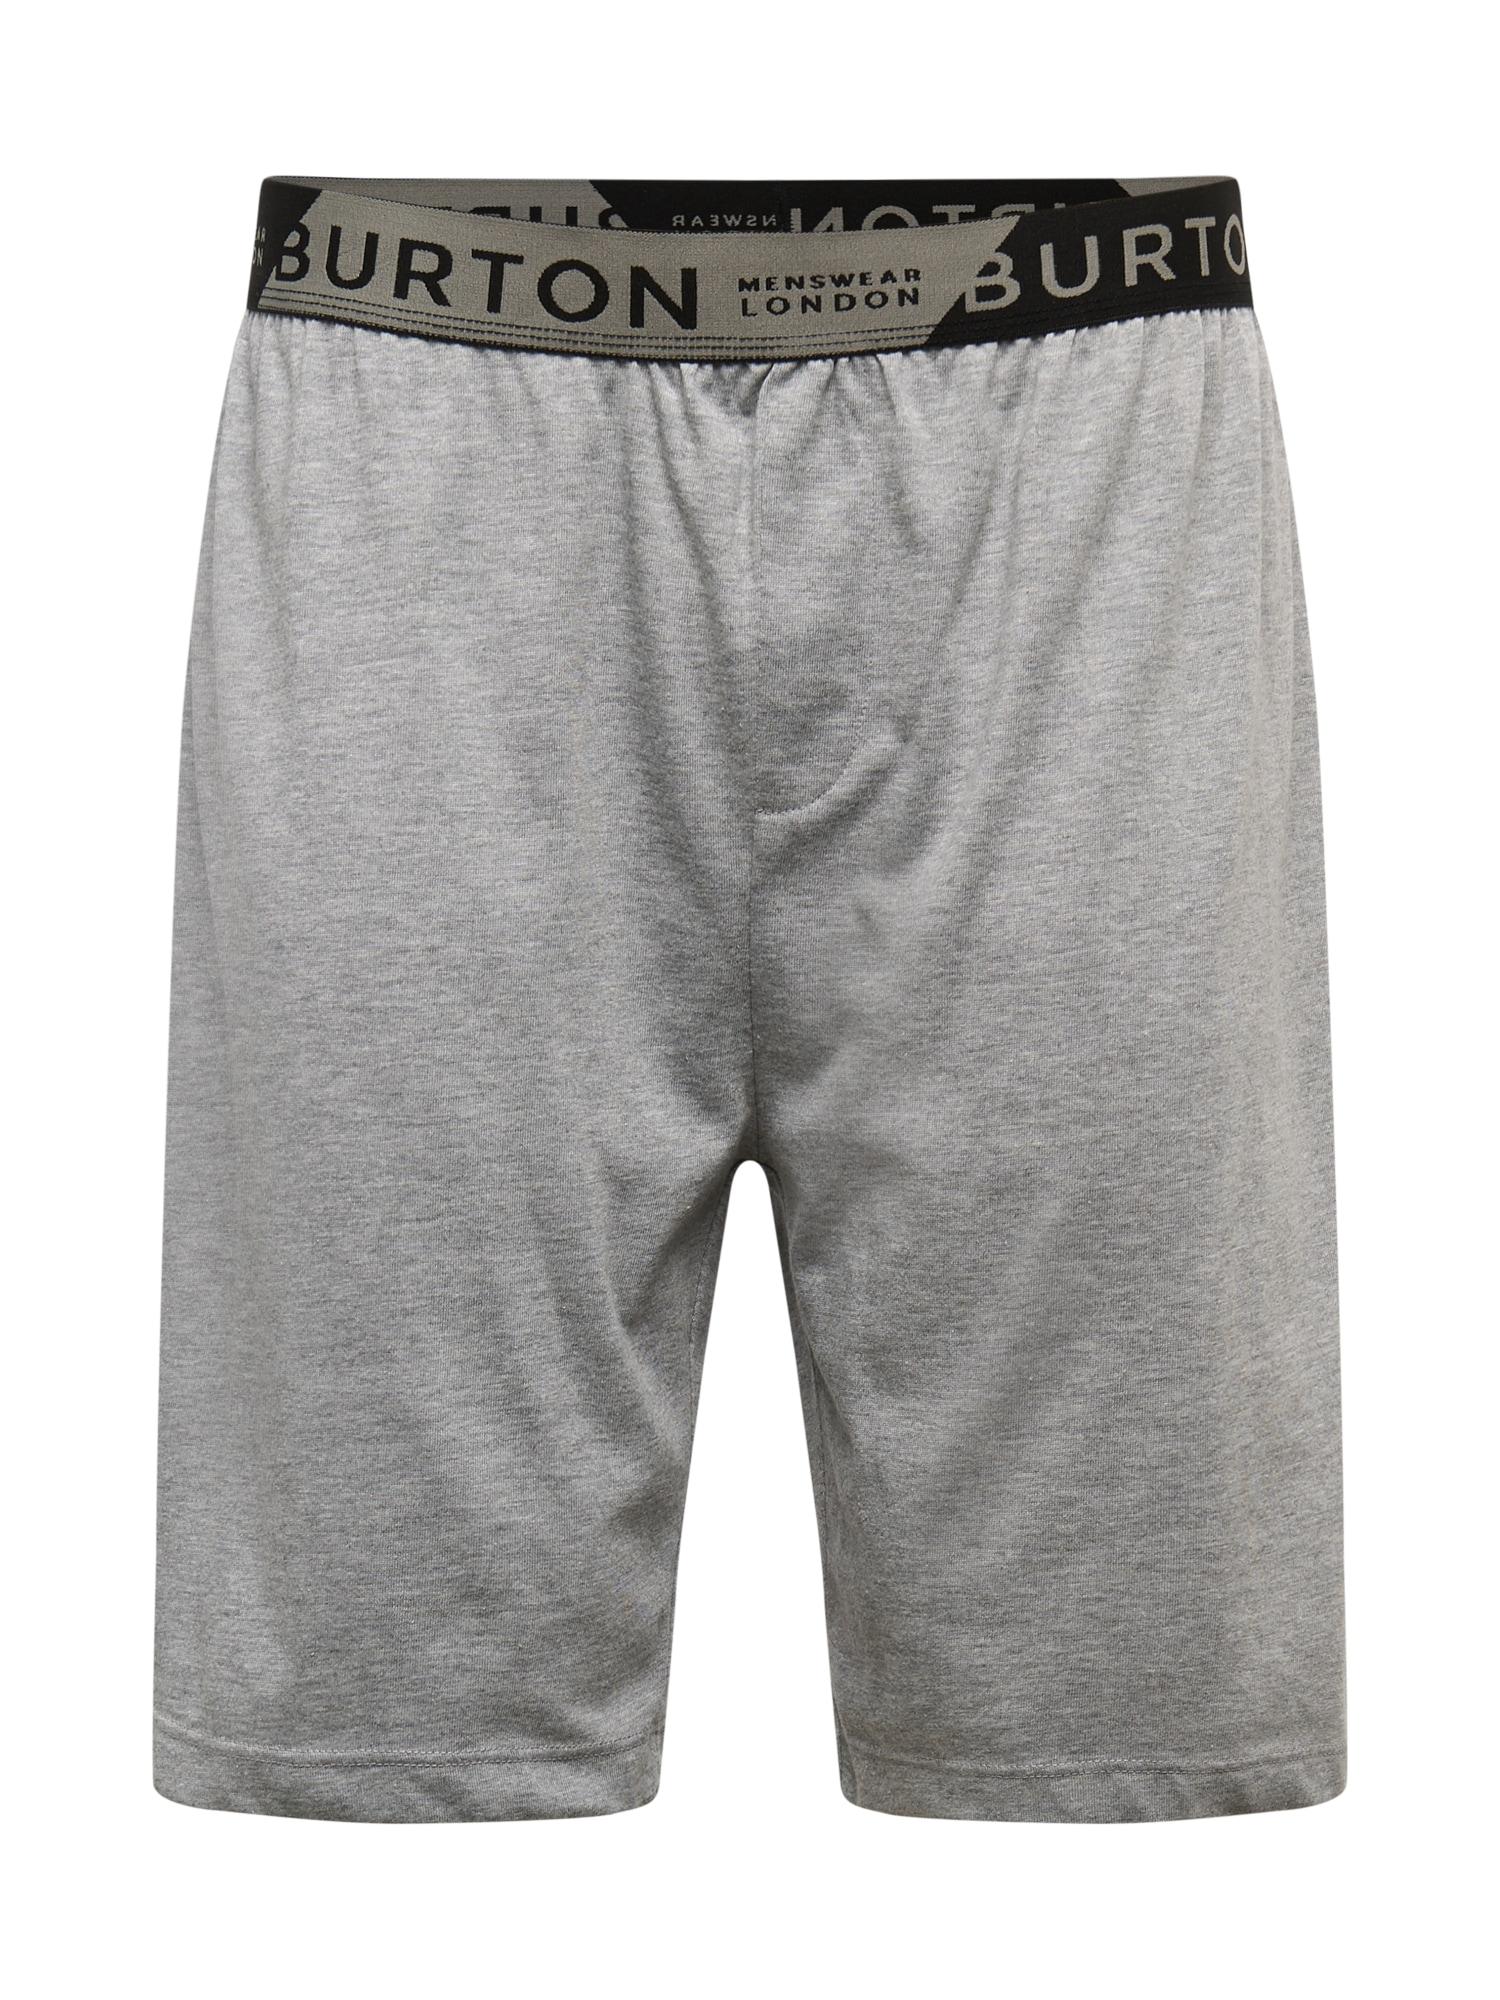 BURTON MENSWEAR LONDON Kalhoty  šedá / tmavě šedá / černá